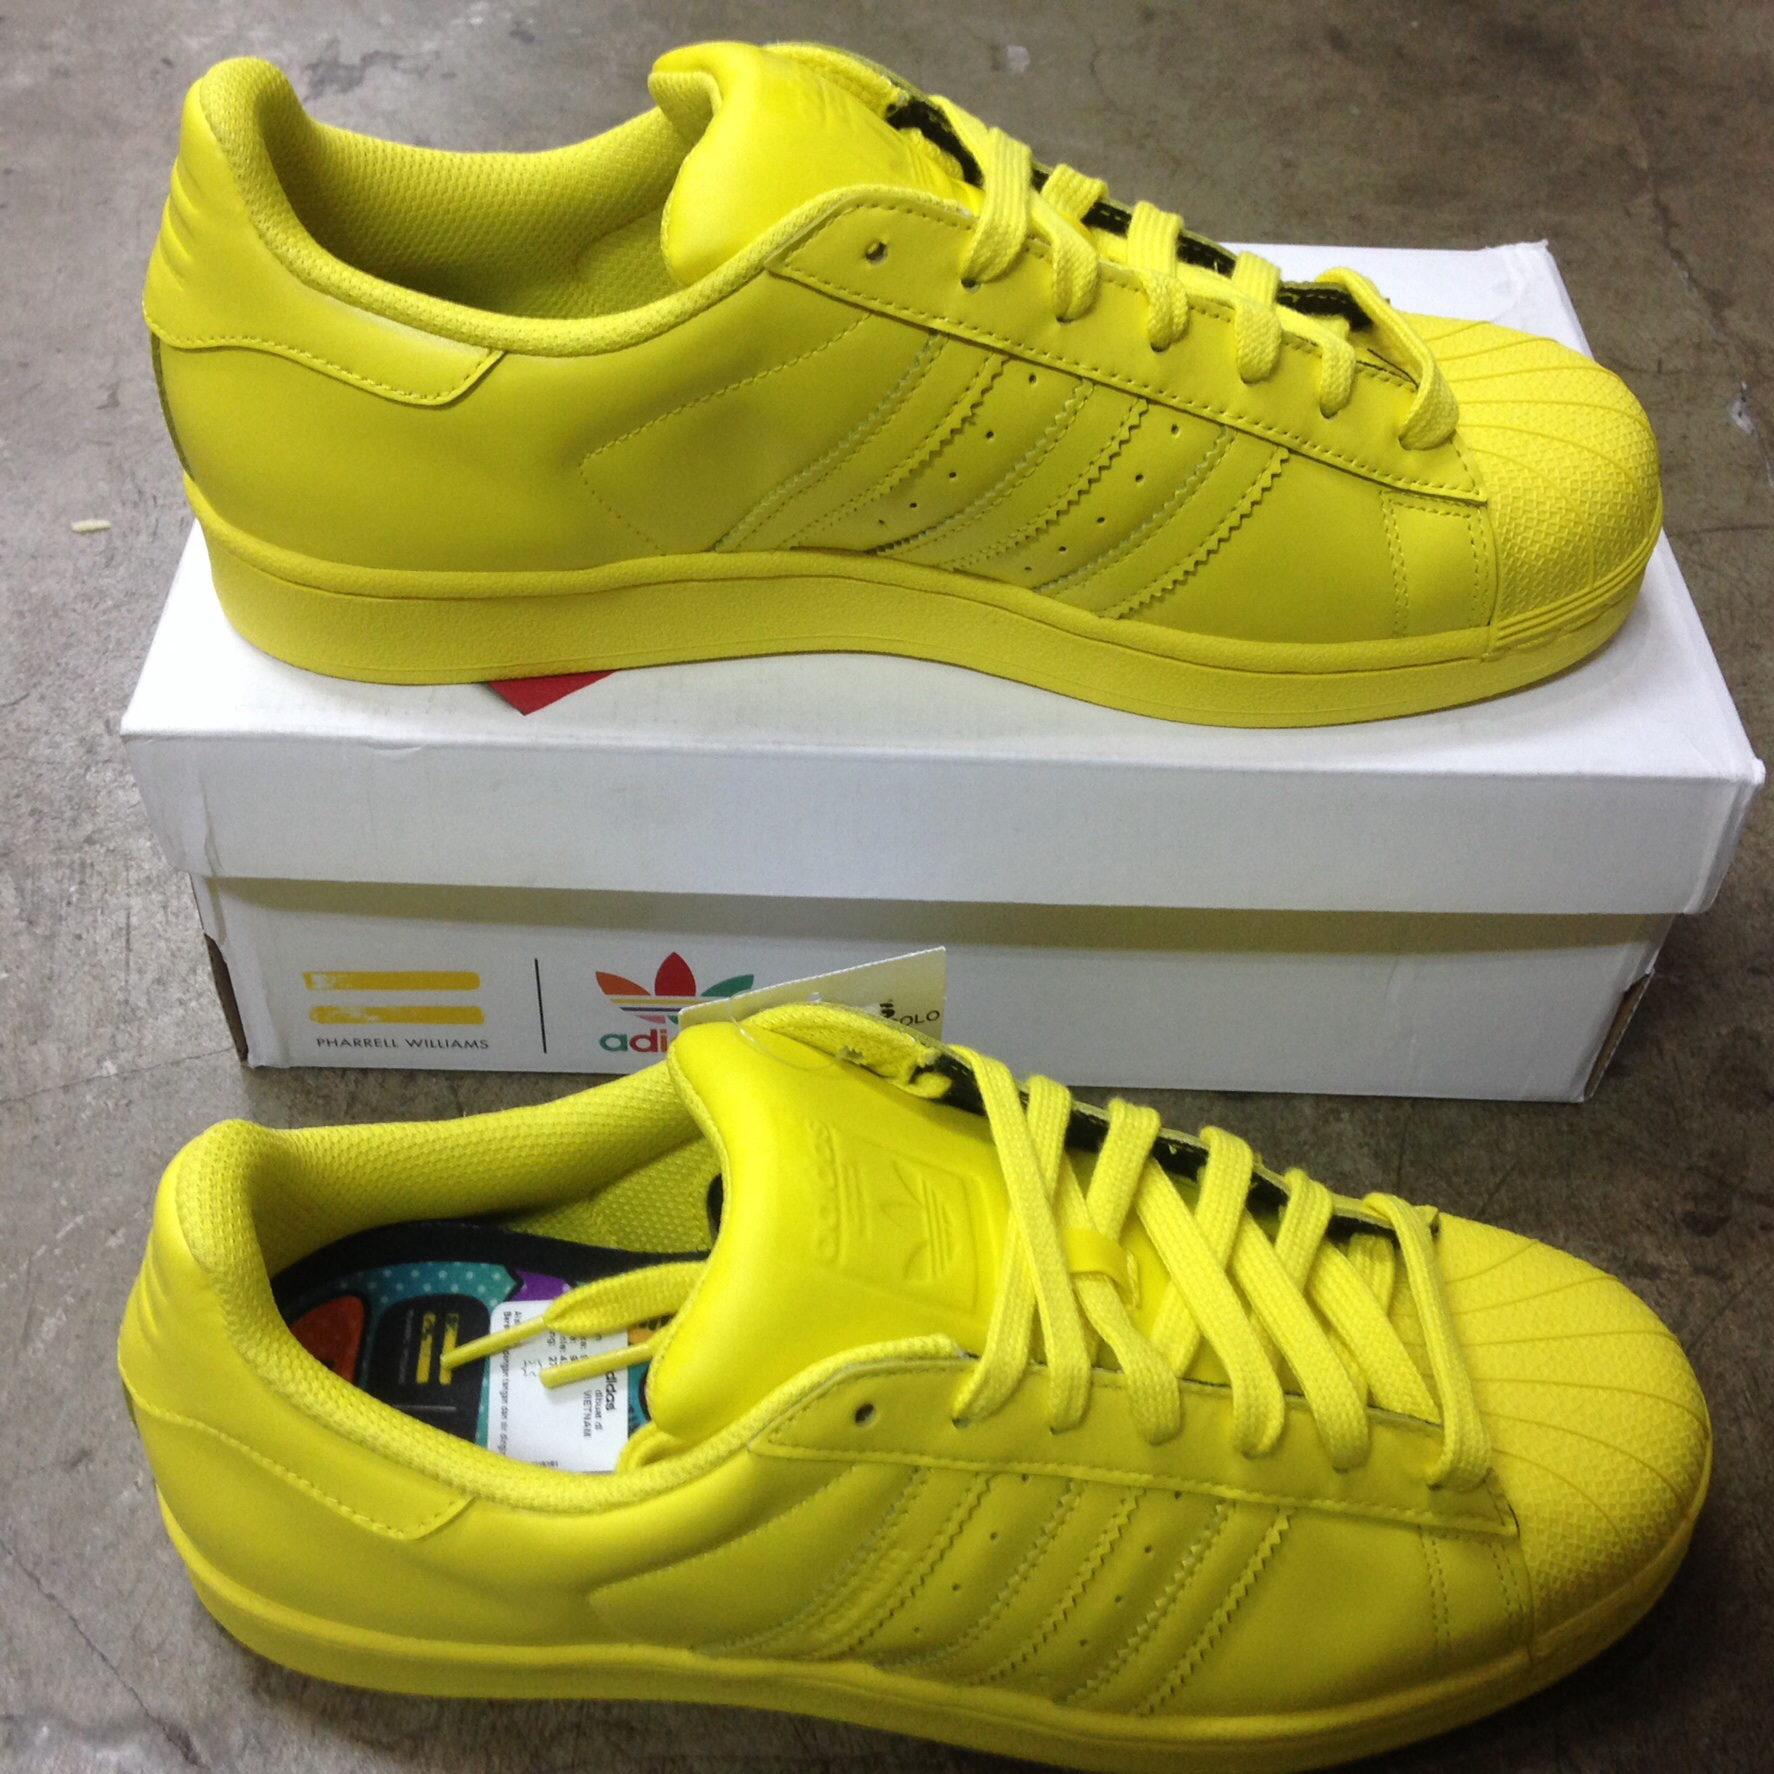 Jual Adidas Superstar Supercolor Pack Yellow Sz 43 1 3. Sepatu ... c9cc8cf702